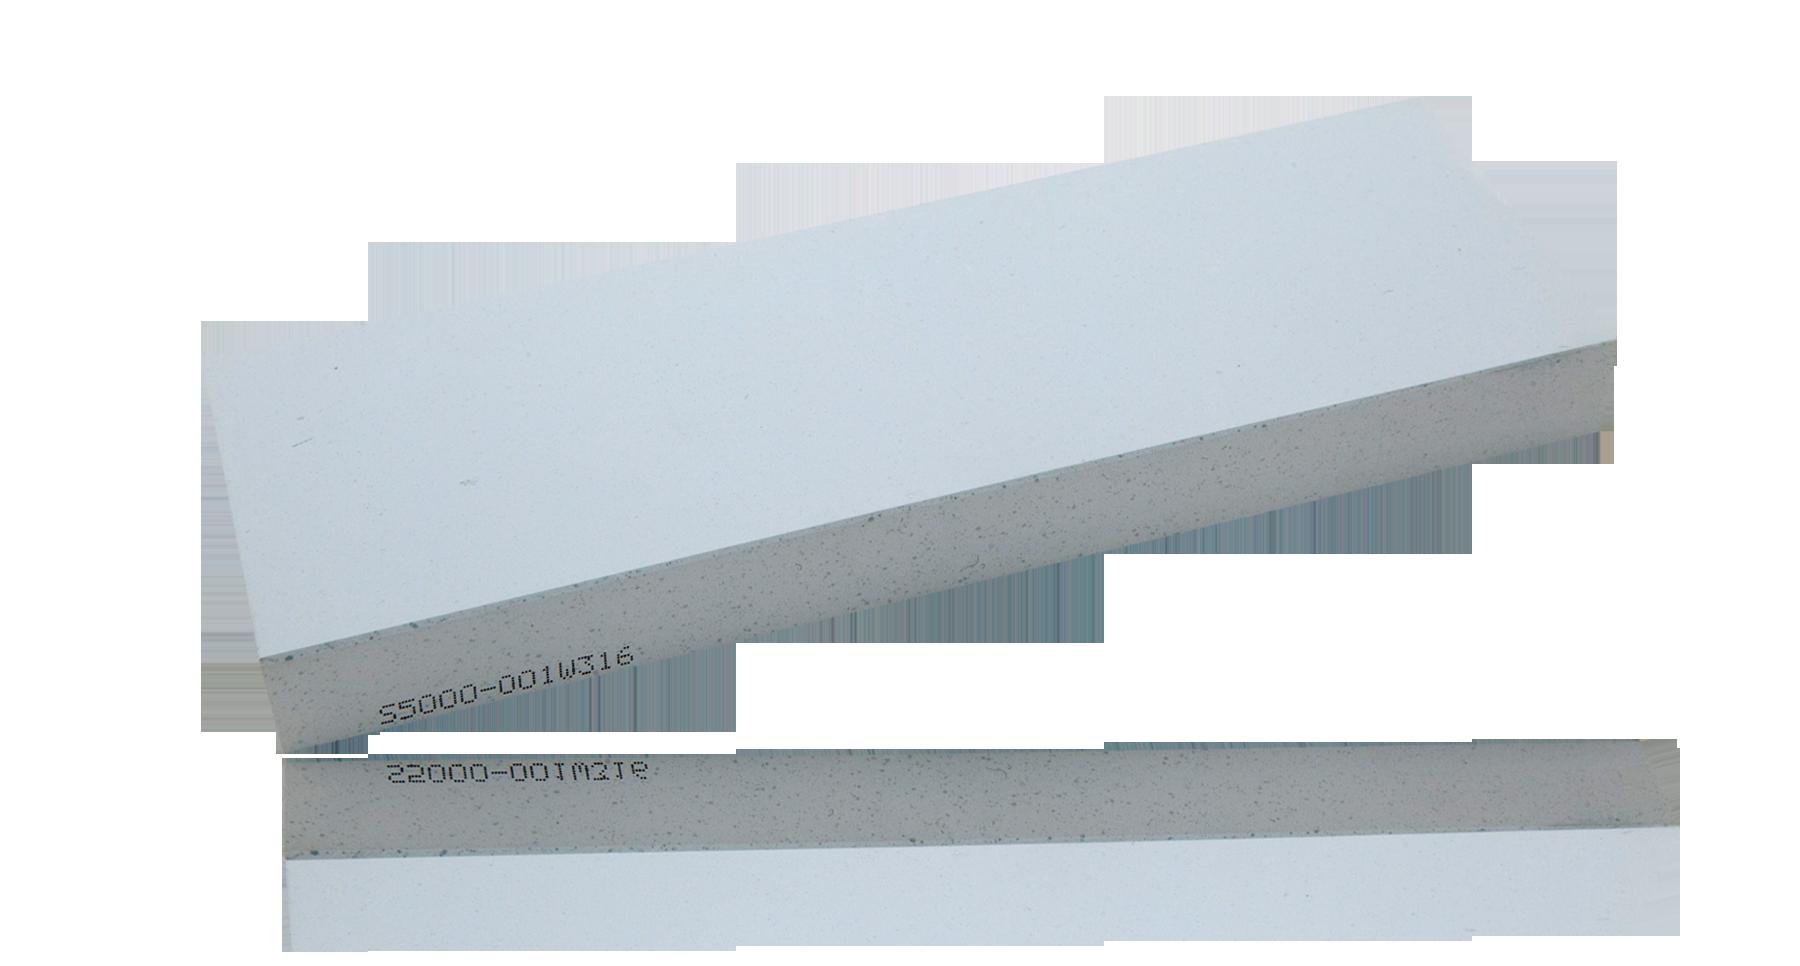 Камень точильный Naniwa S-450.